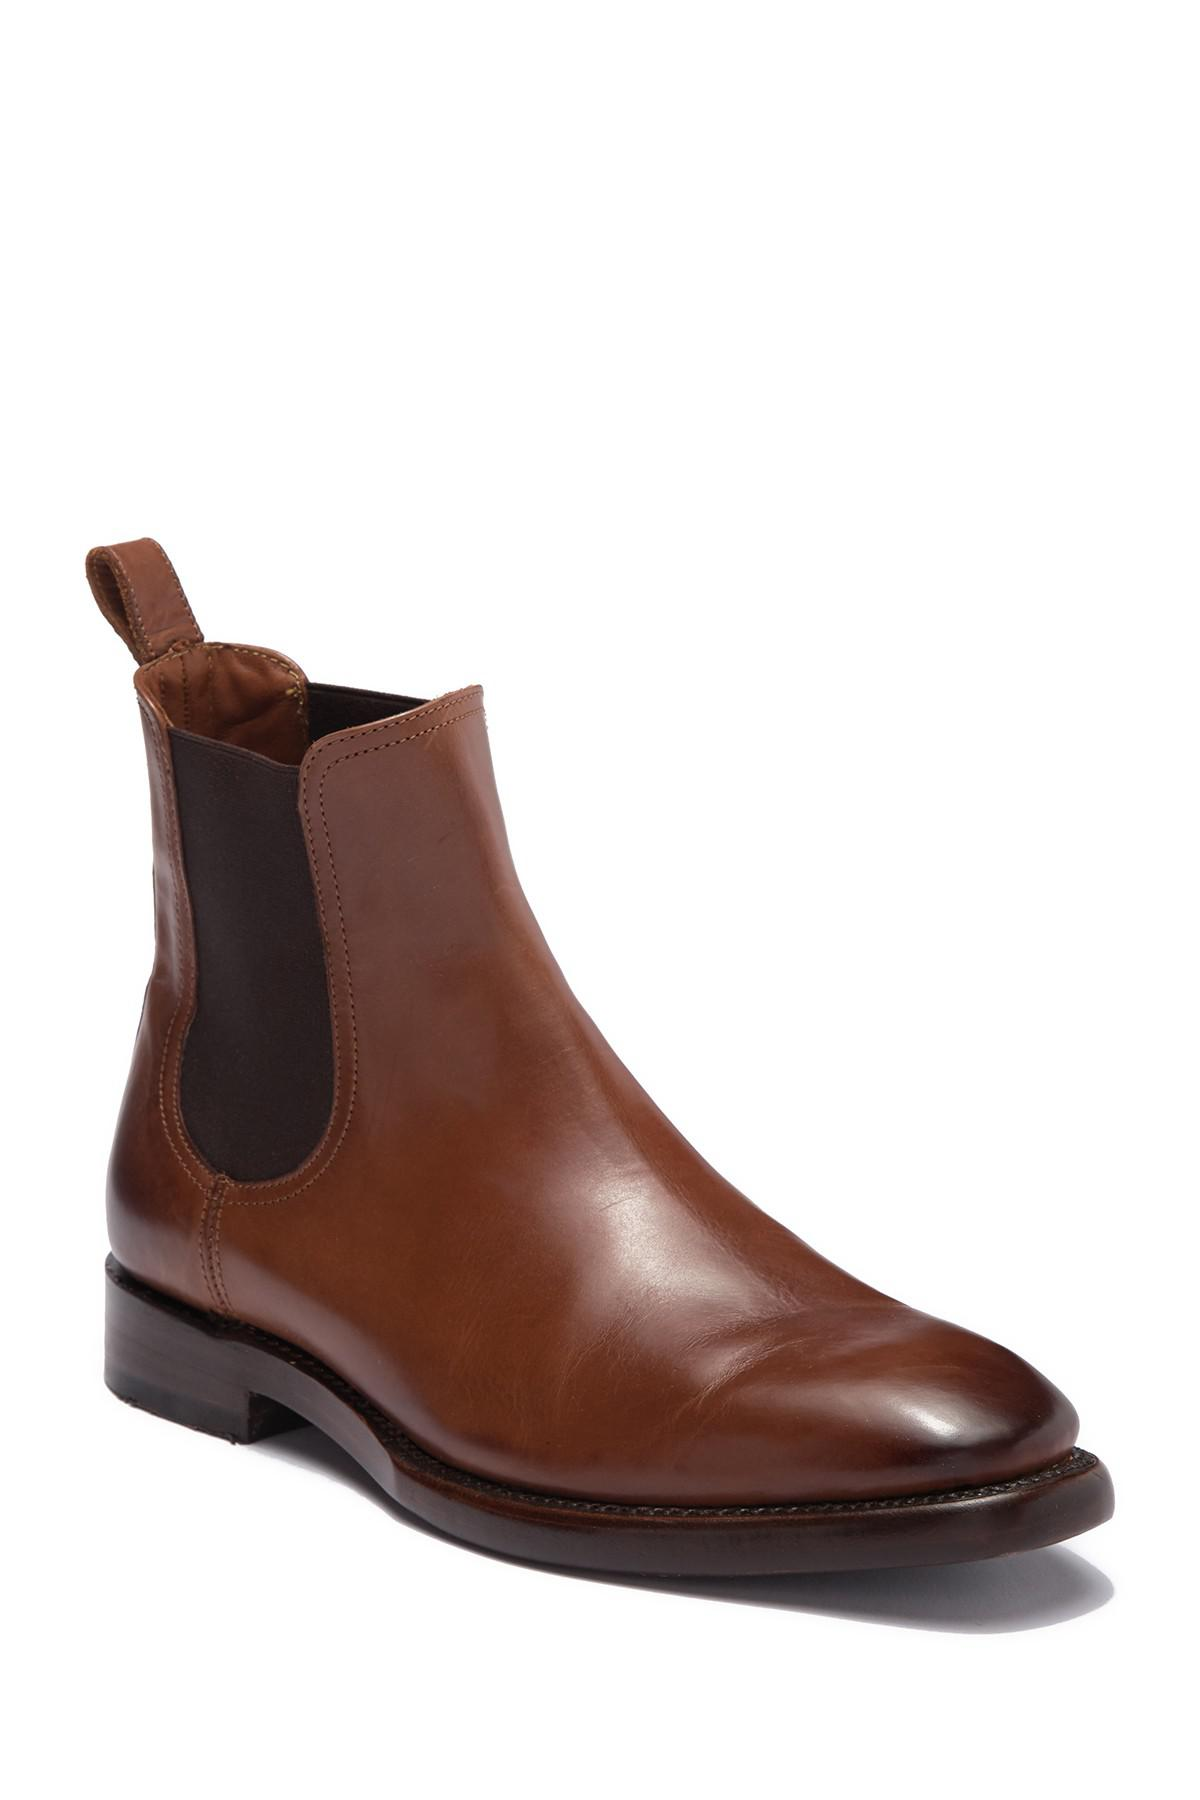 8aa7157cb9d8 Frye Weston Chelsea Boot in Brown for Men - Lyst